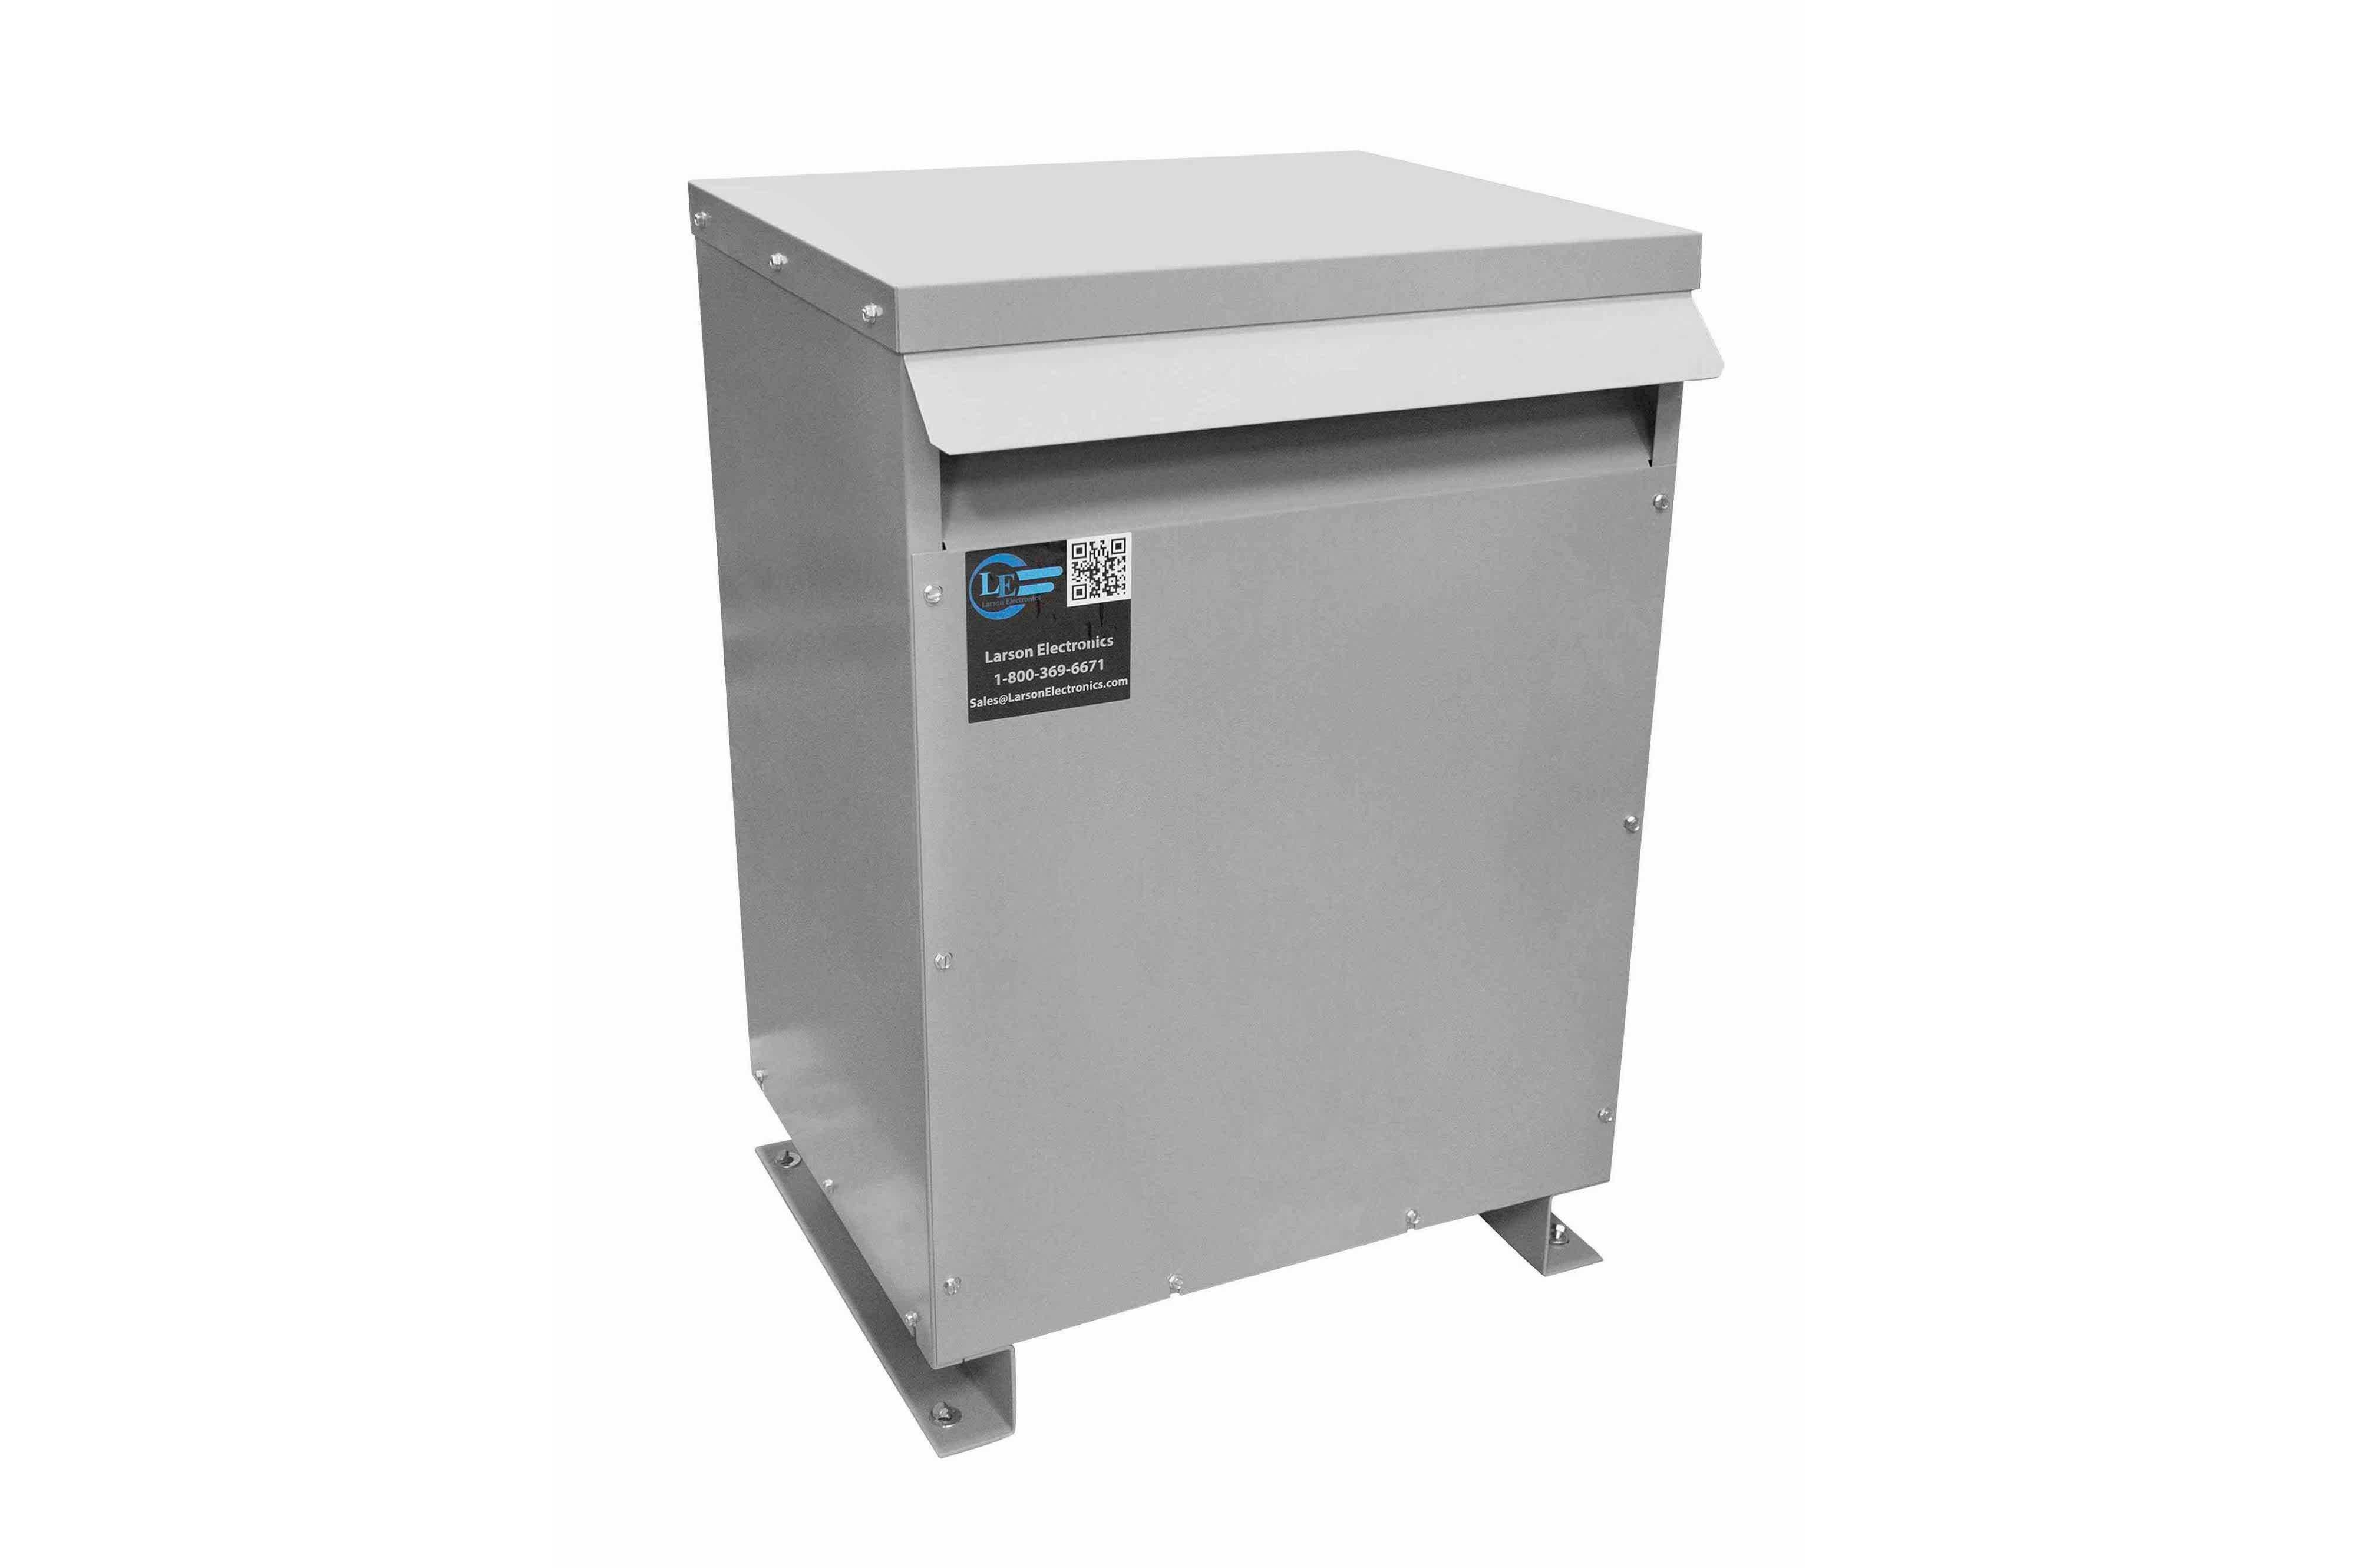 42.5 kVA 3PH Isolation Transformer, 480V Wye Primary, 480Y/277 Wye-N Secondary, N3R, Ventilated, 60 Hz